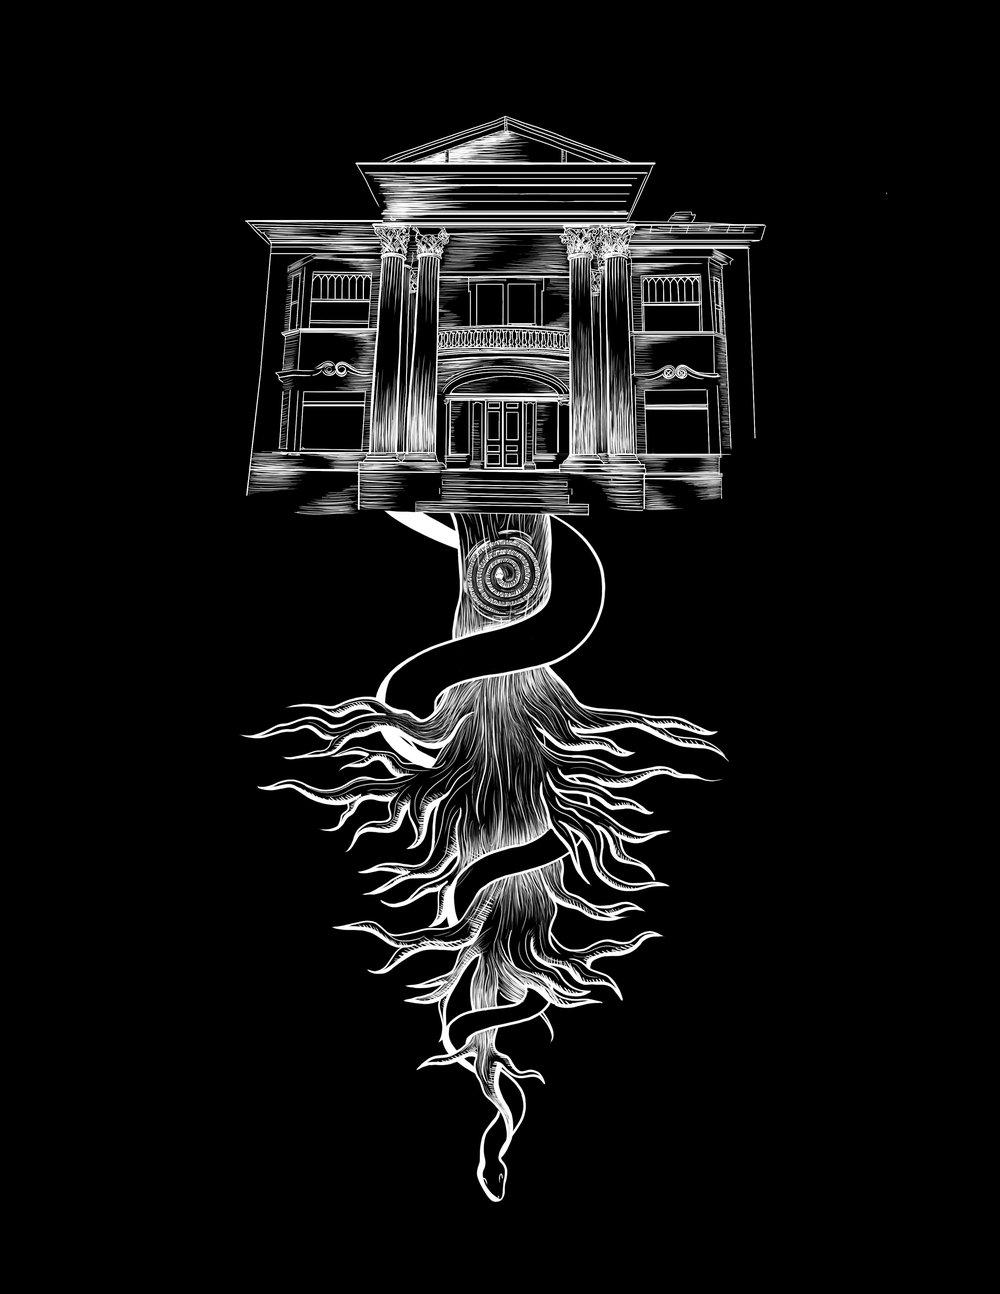 Hulu_Halloween_Shadows_WhiteHouse_WE_v03.jpg